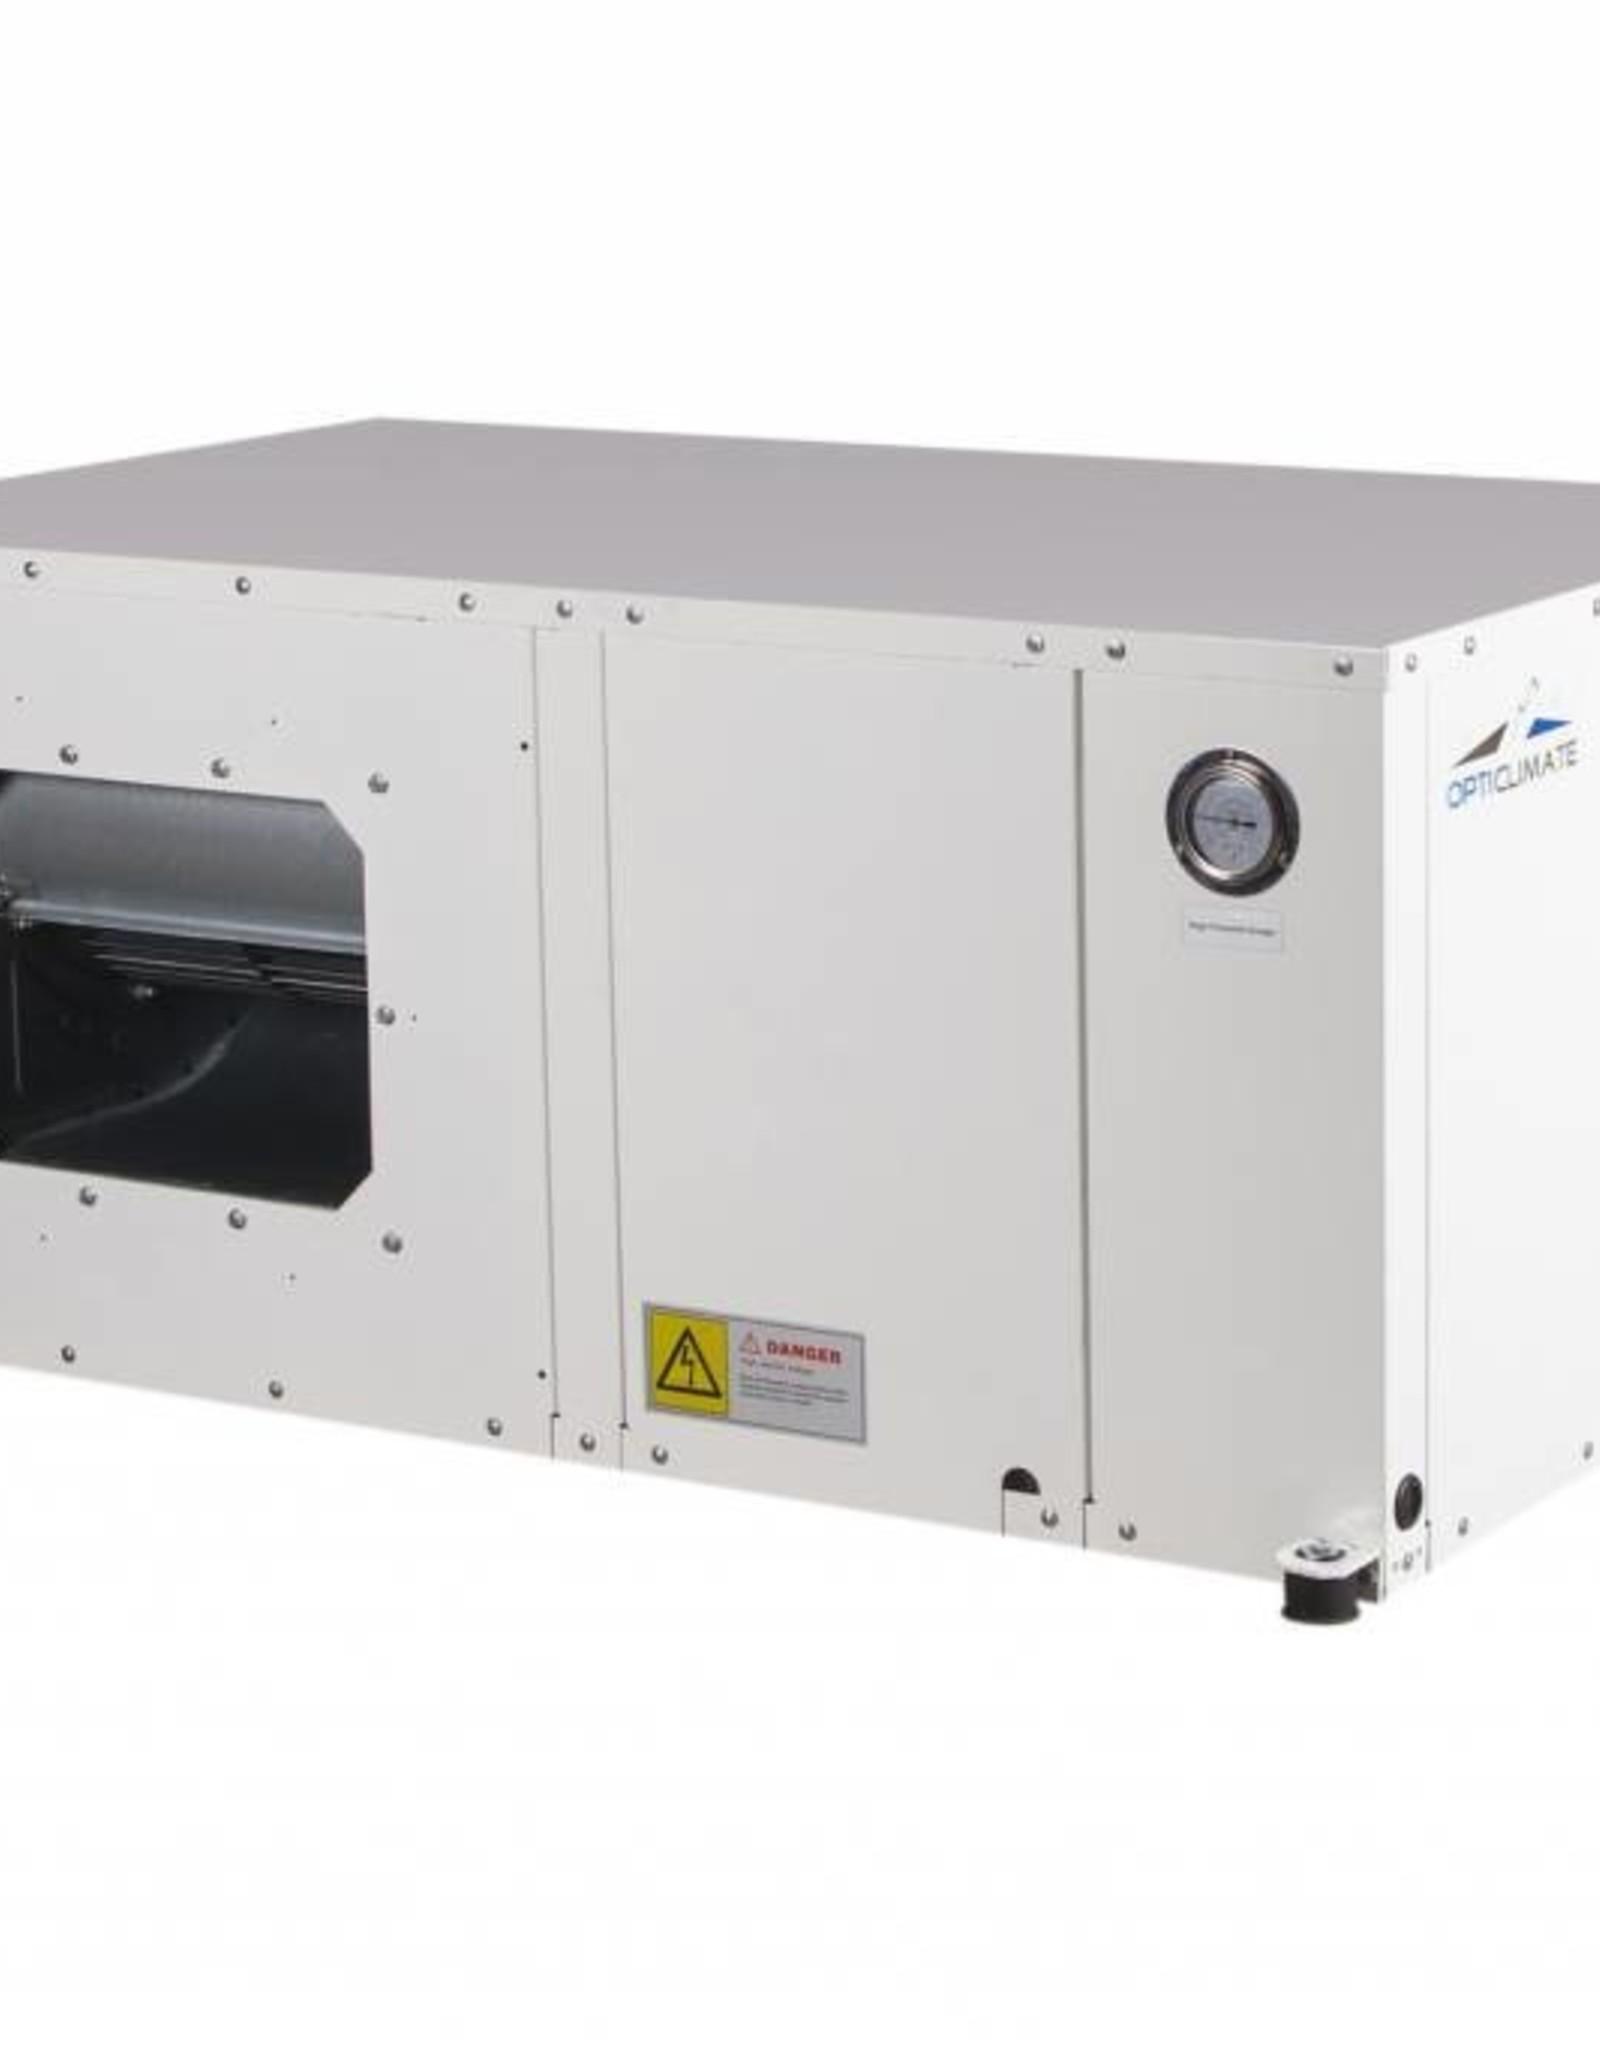 OptiClimate 15000 PRO3 Inverter